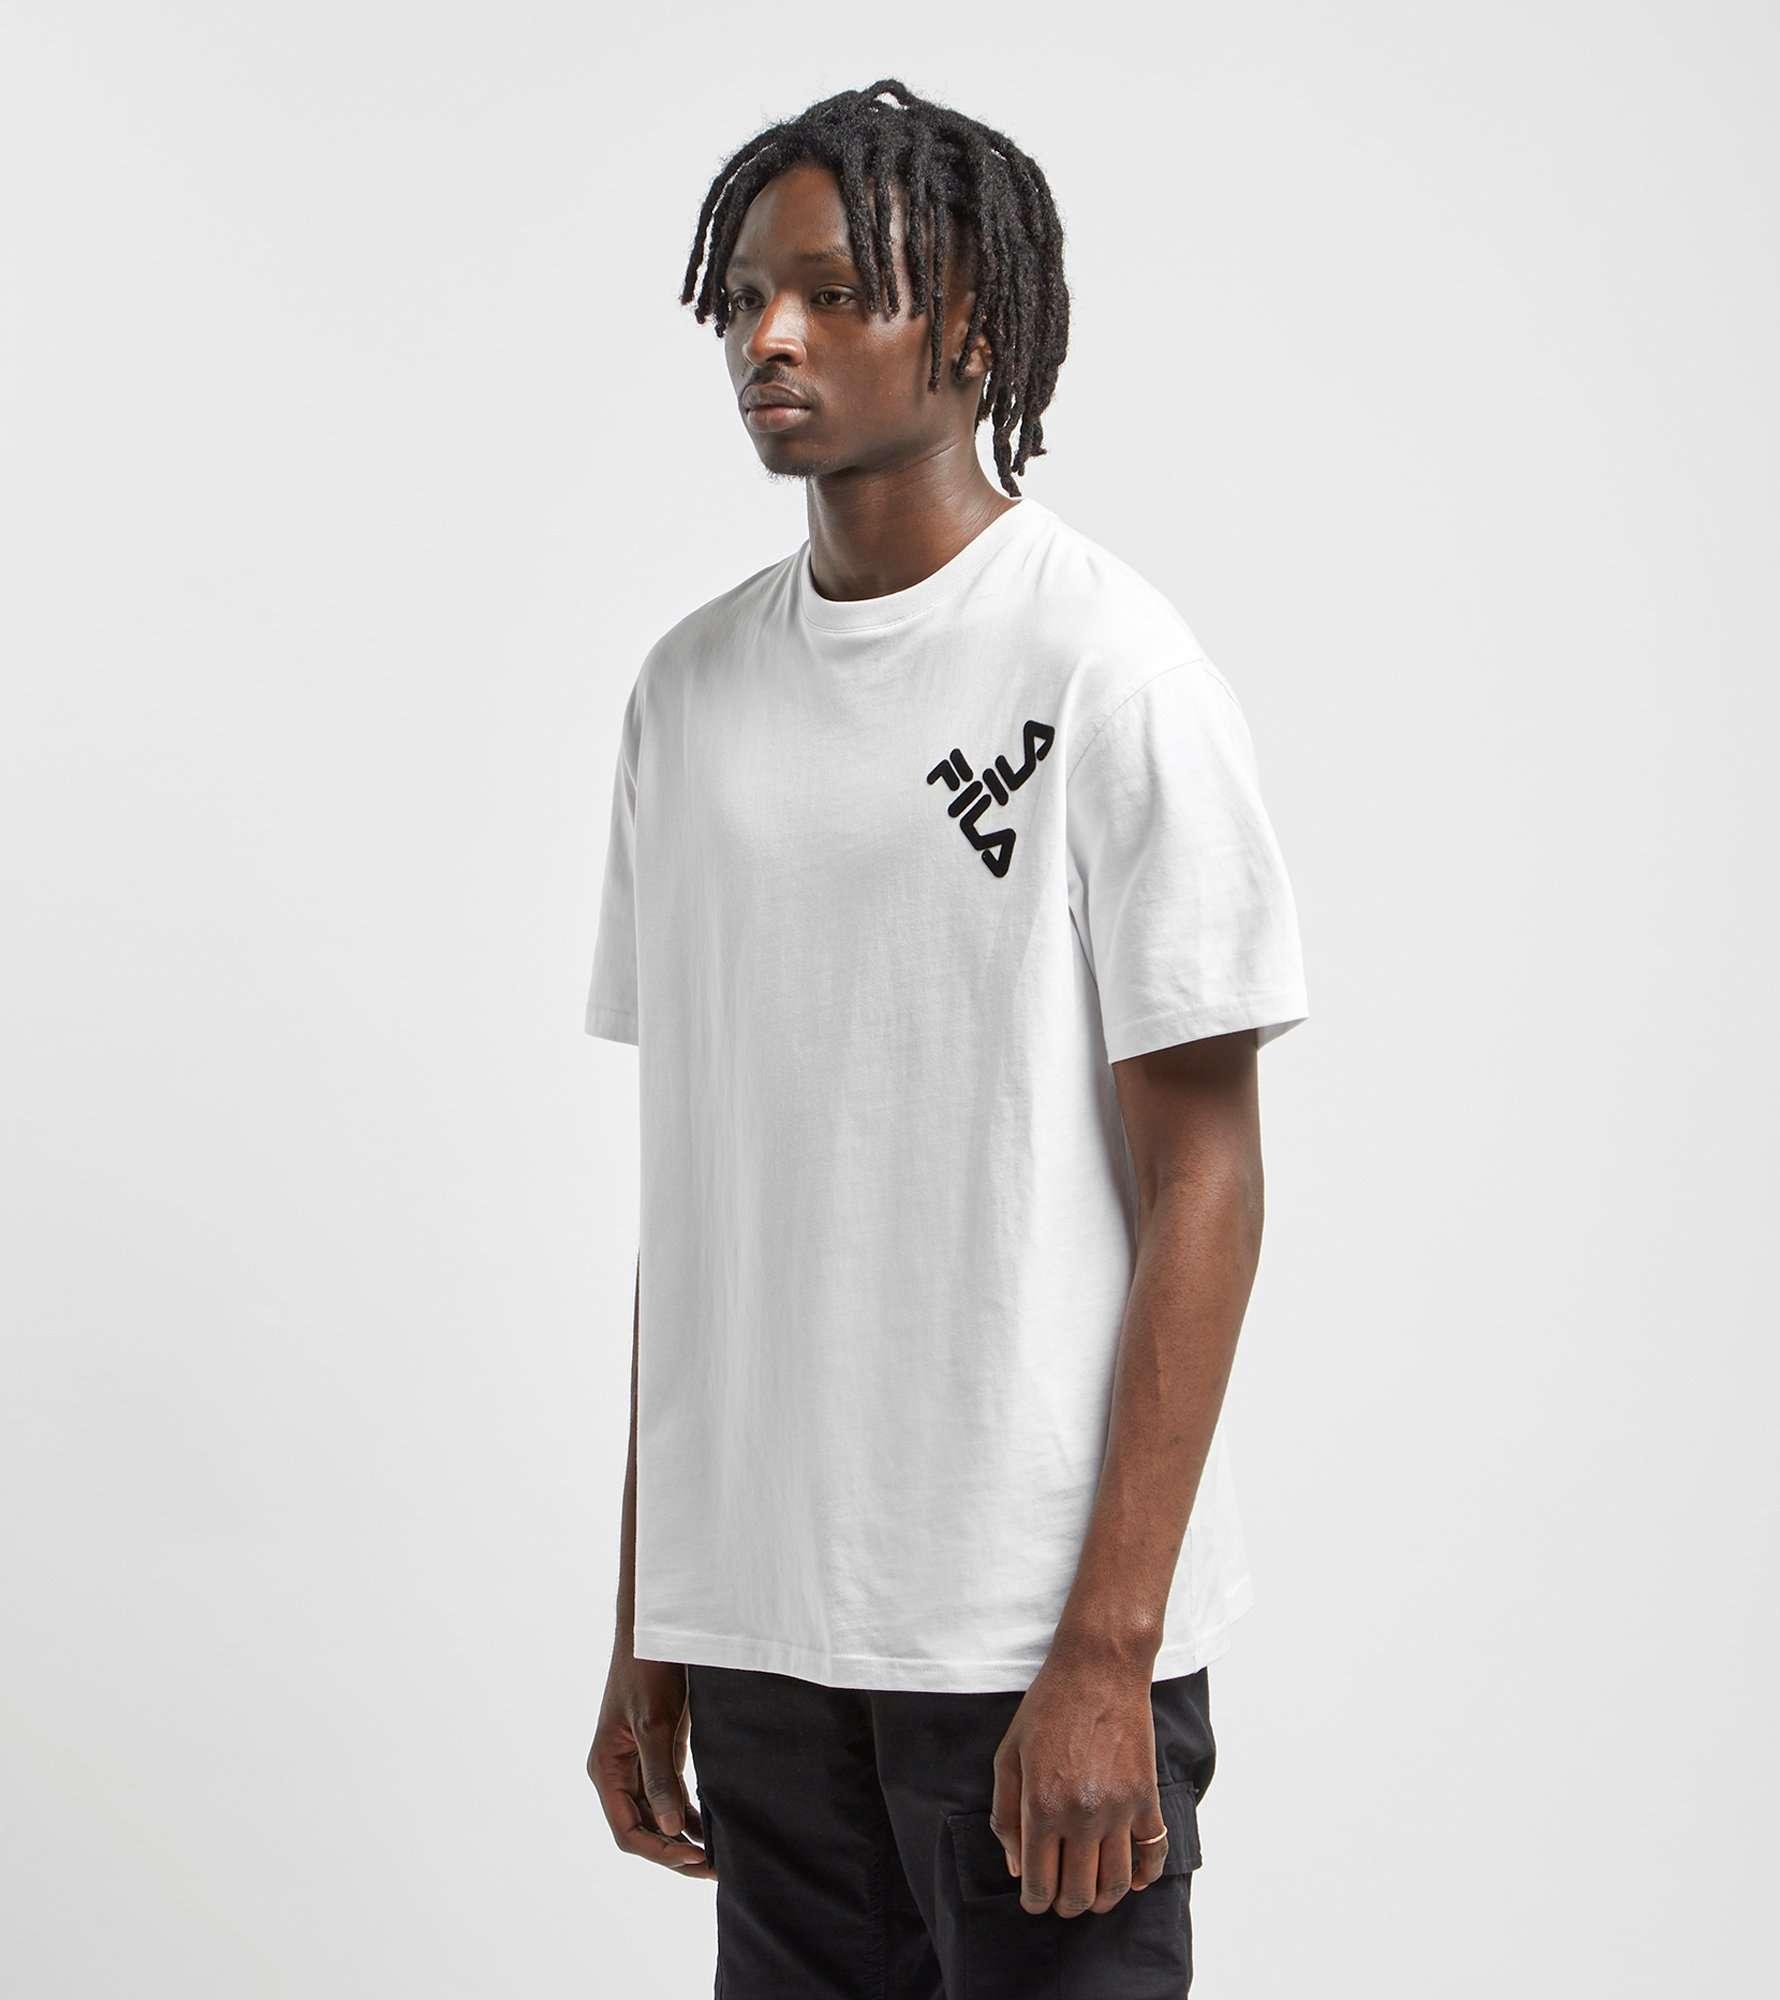 Fila Diagonal T-Shirt - size? Exclusive